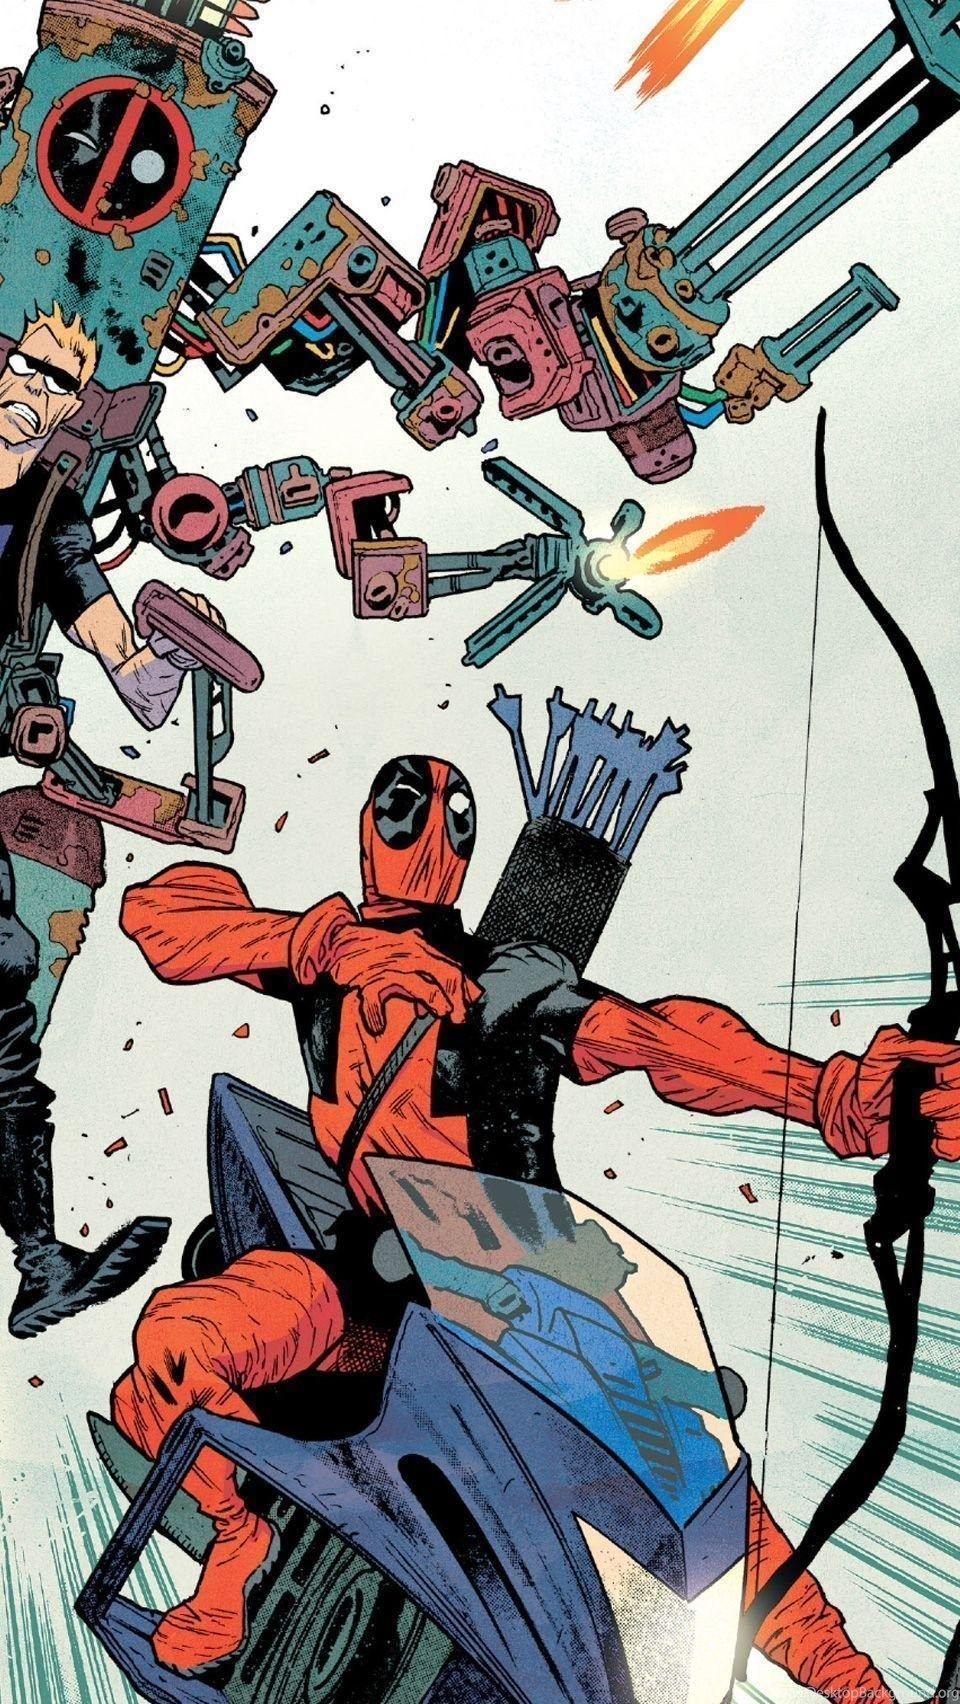 Comic Book Deadpool Wallpapers Top Free Comic Book Deadpool